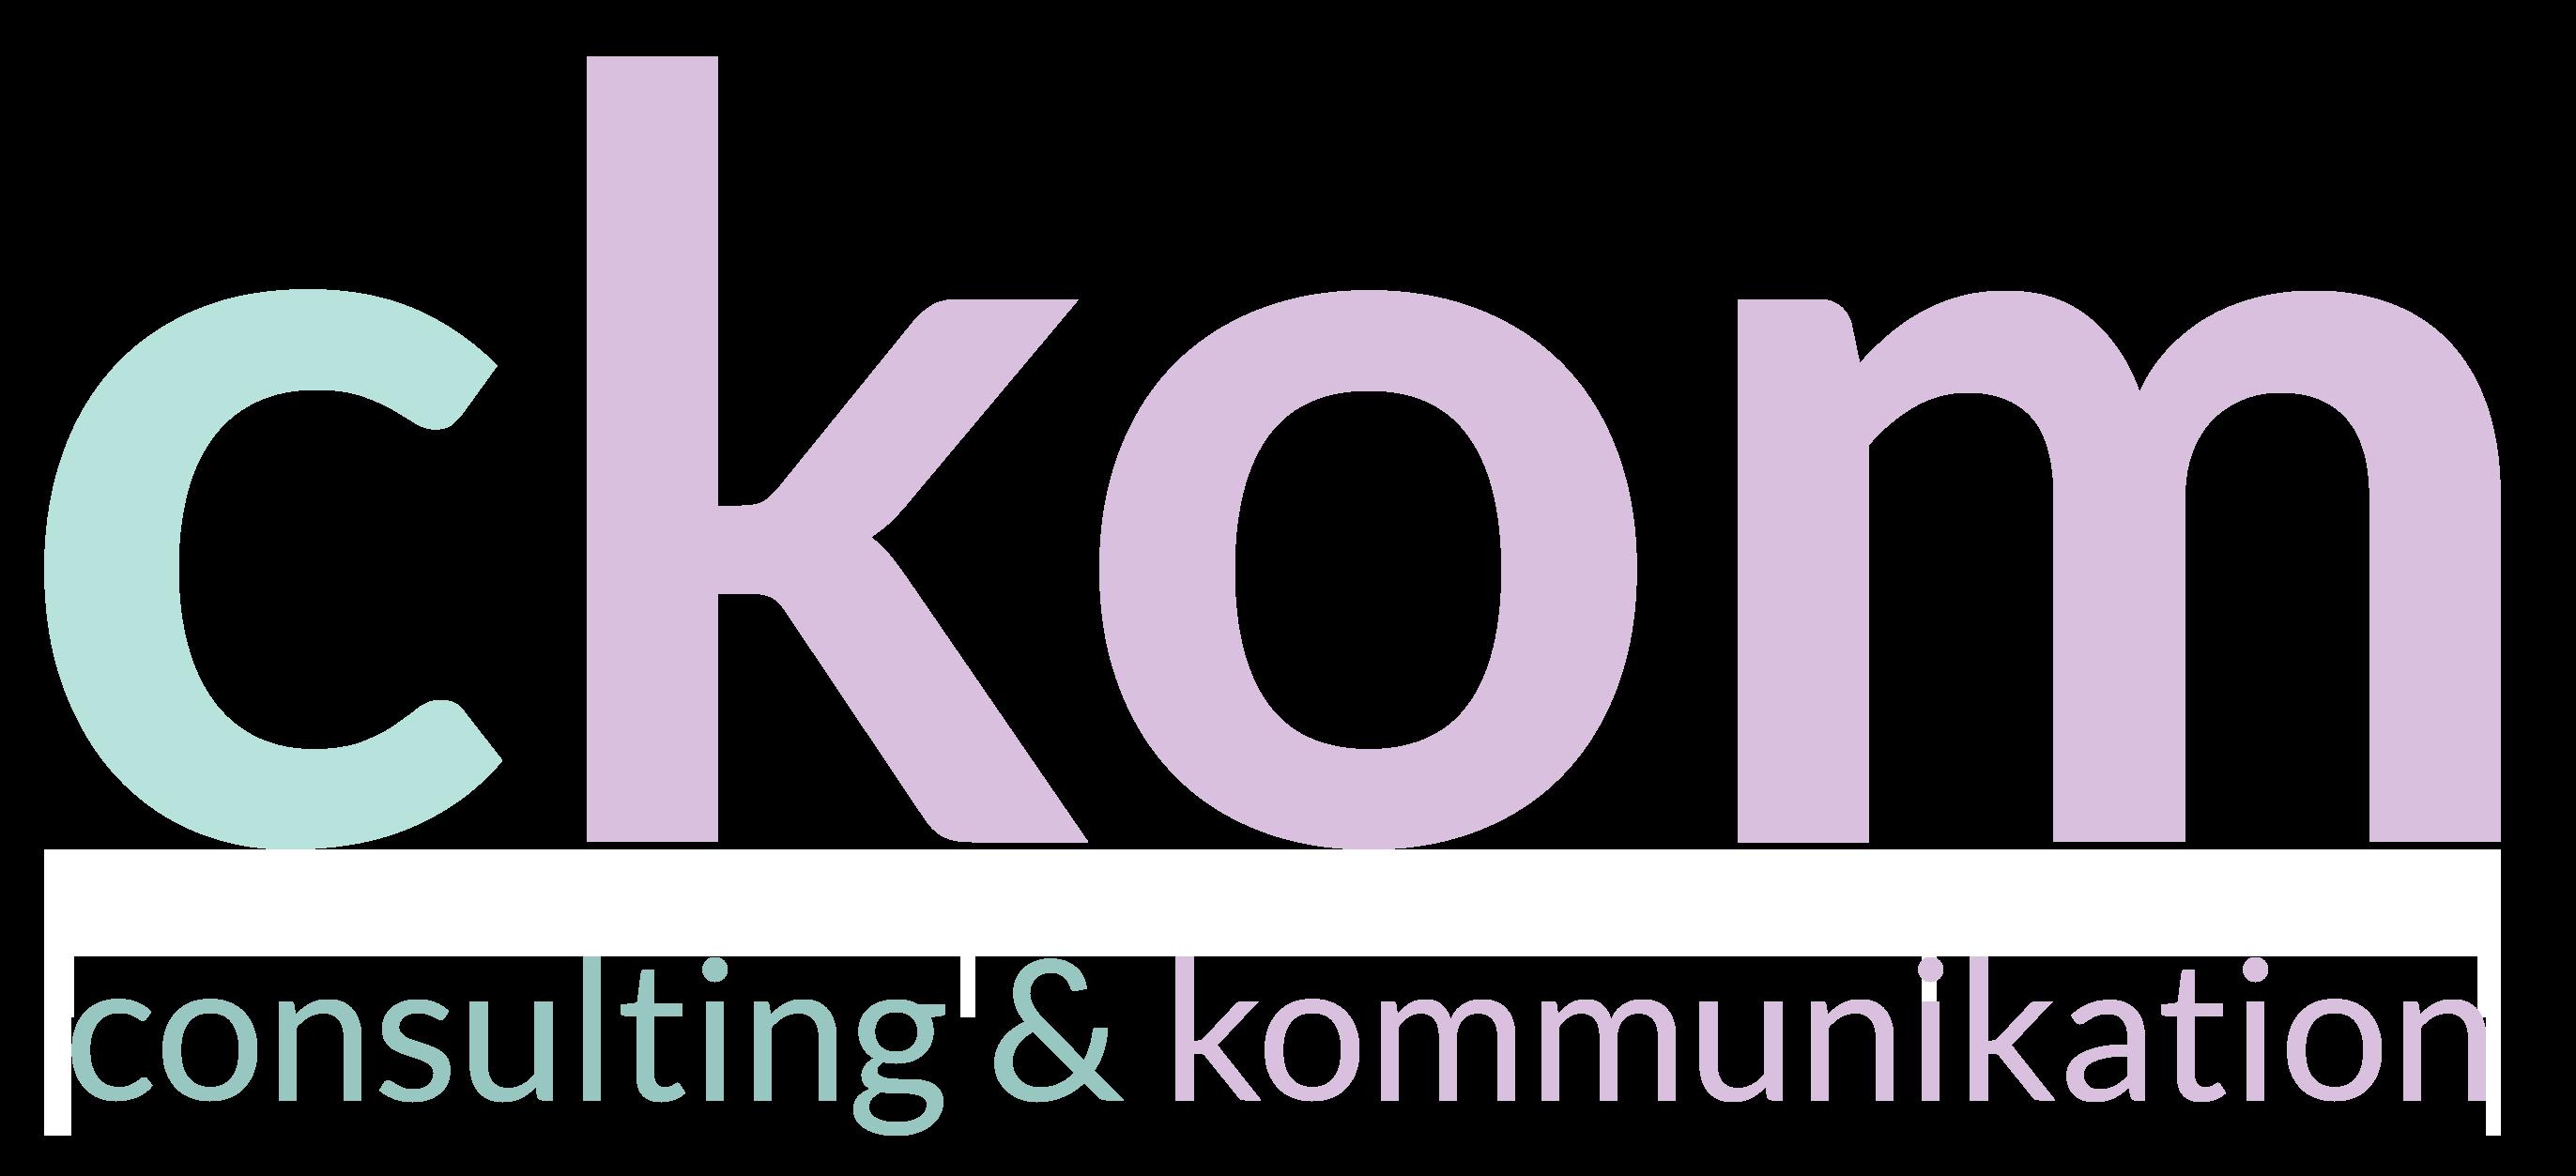 ckom - Consulting & Kommunikation